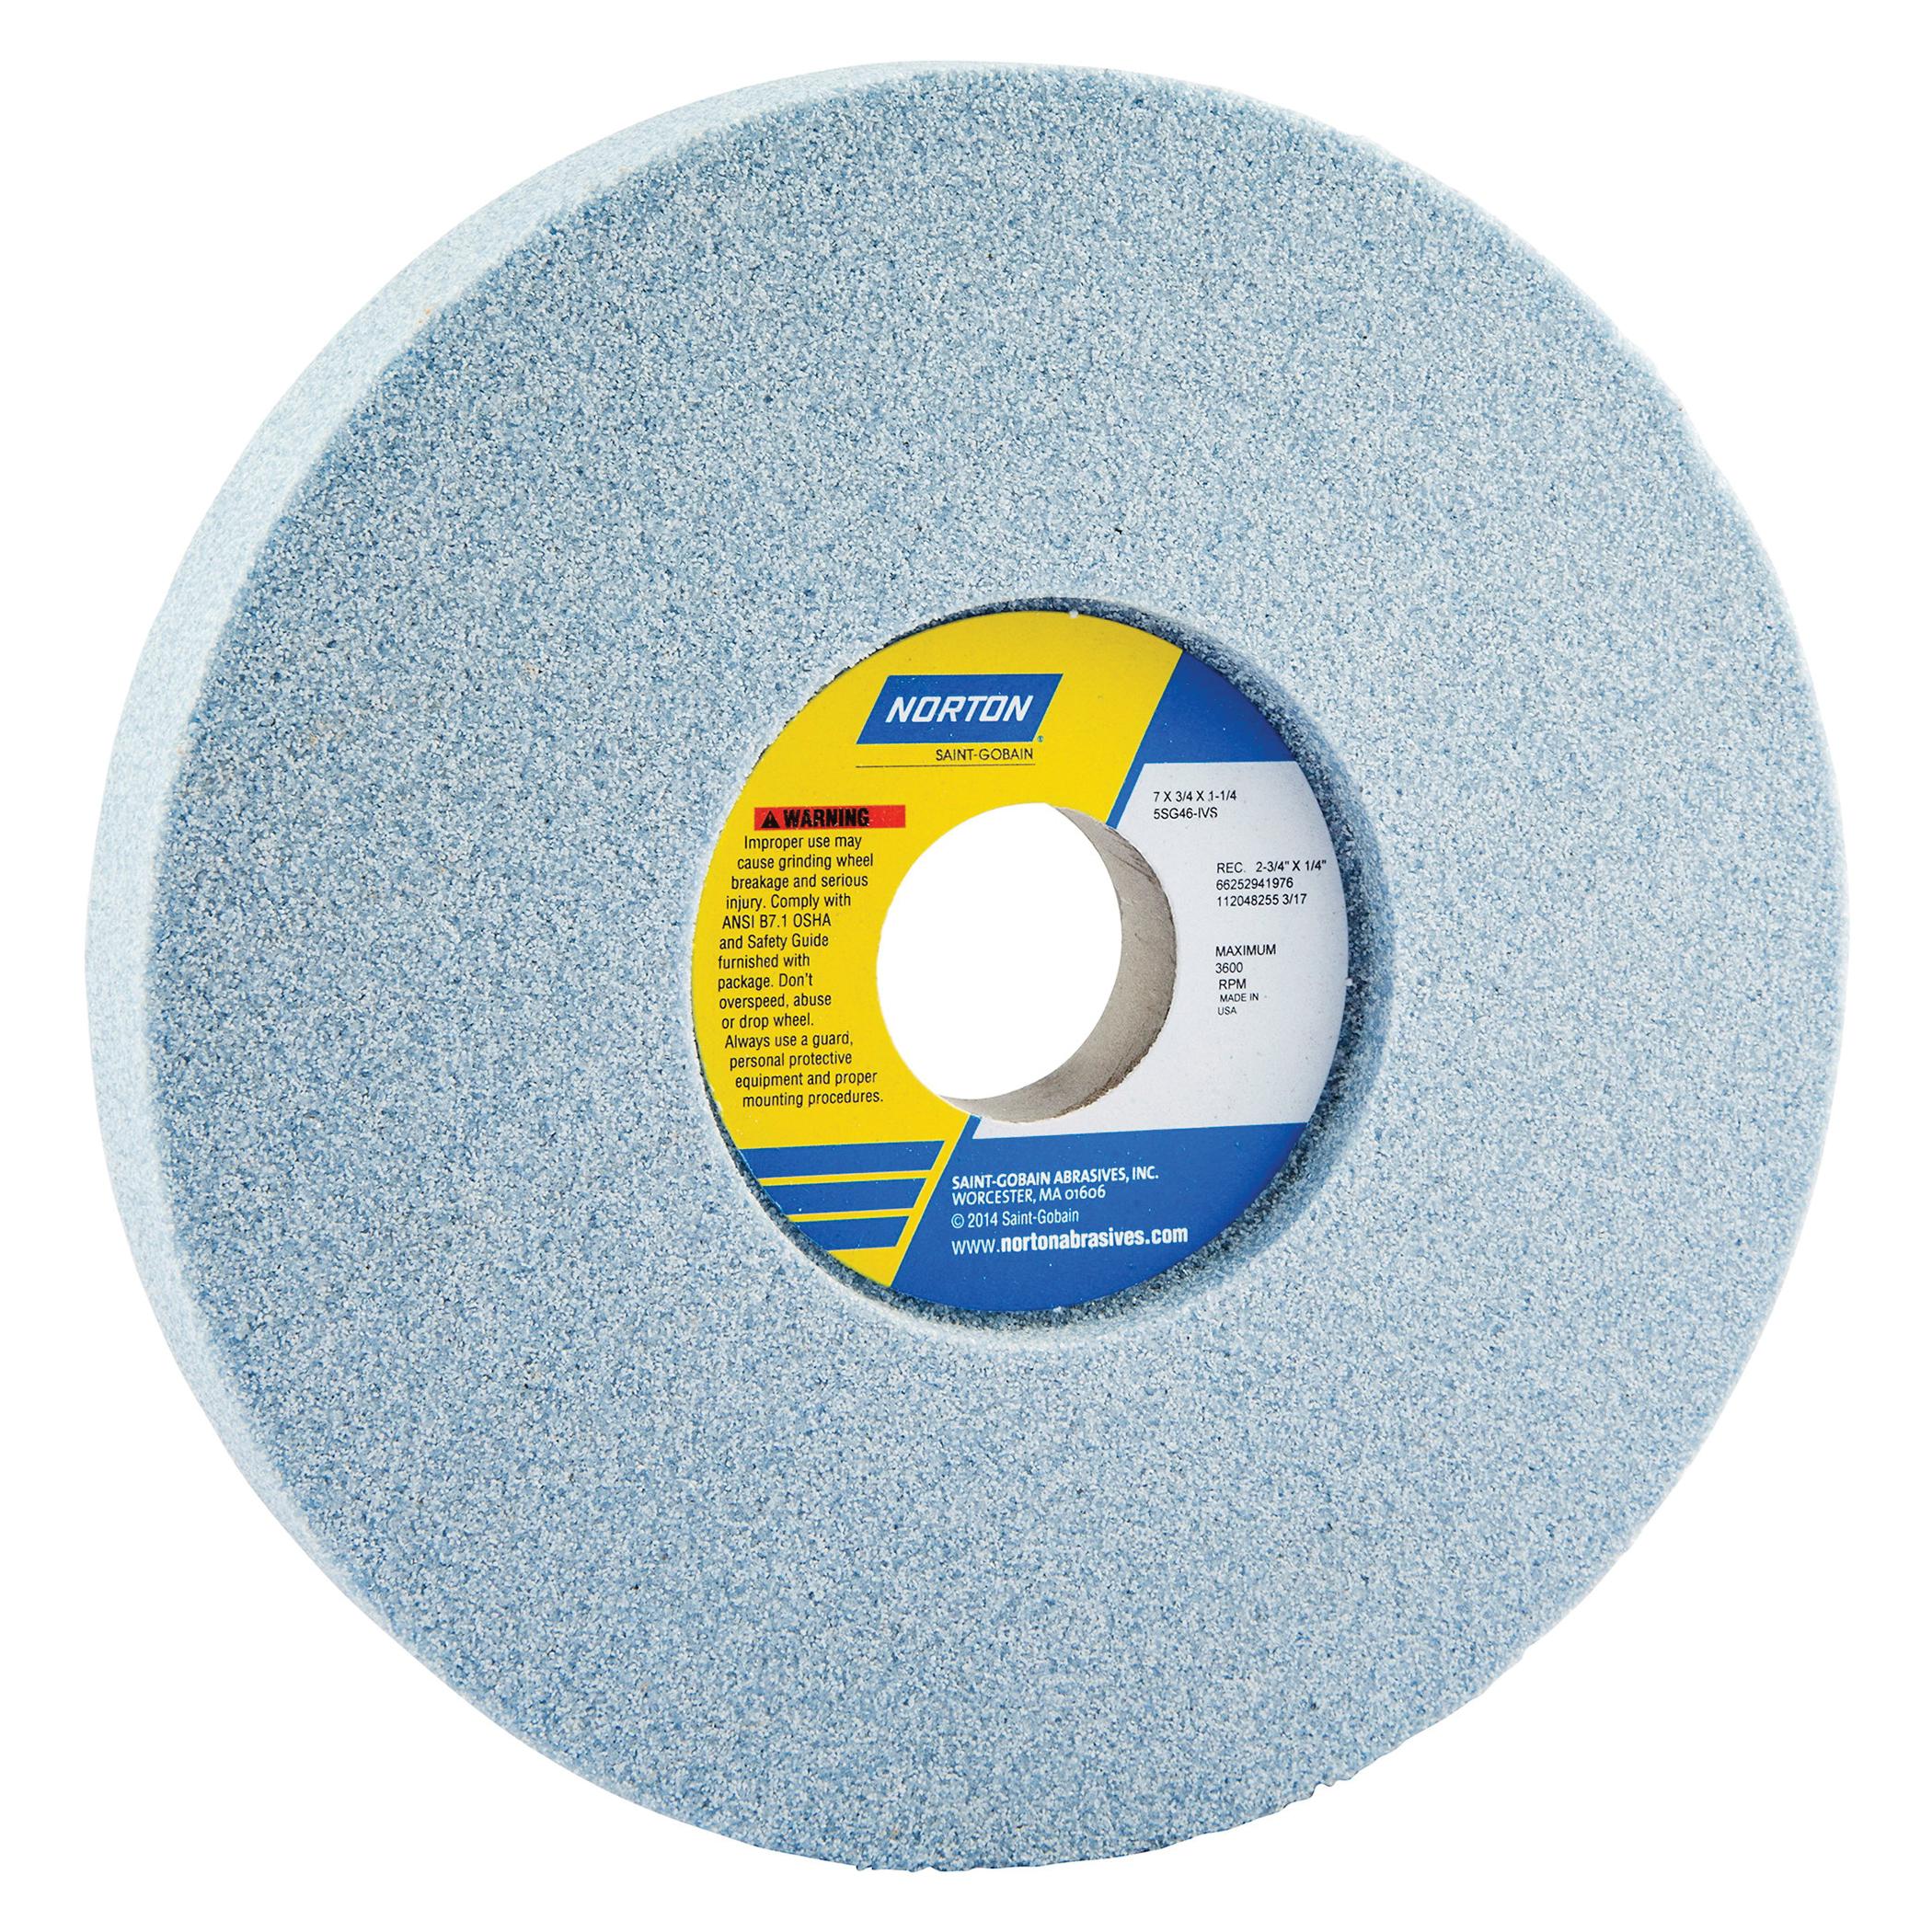 Norton® 66252942312 5SG 1-Side Recessed Toolroom Wheel, 7 in Dia x 3/4 in THK, 1-1/4 in Center Hole, 60 Grit, Ceramic Alumina/Friable Aluminum Oxide Abrasive